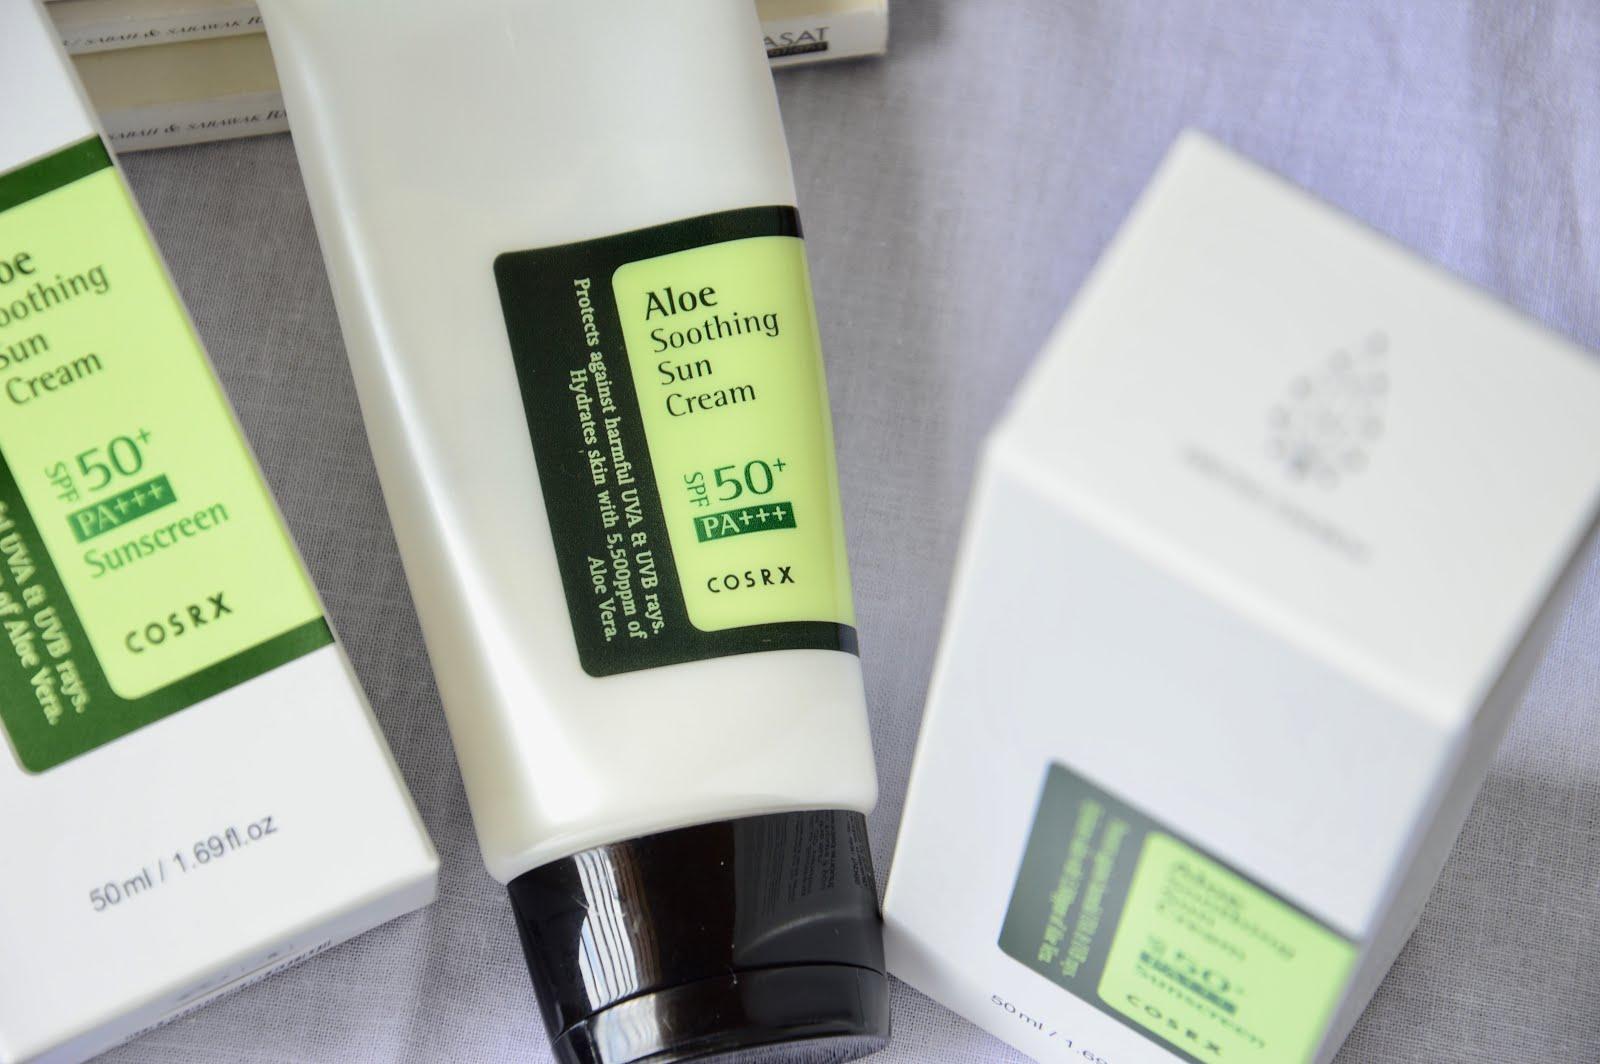 COSRX Aloe Soothing Sun Cream Review